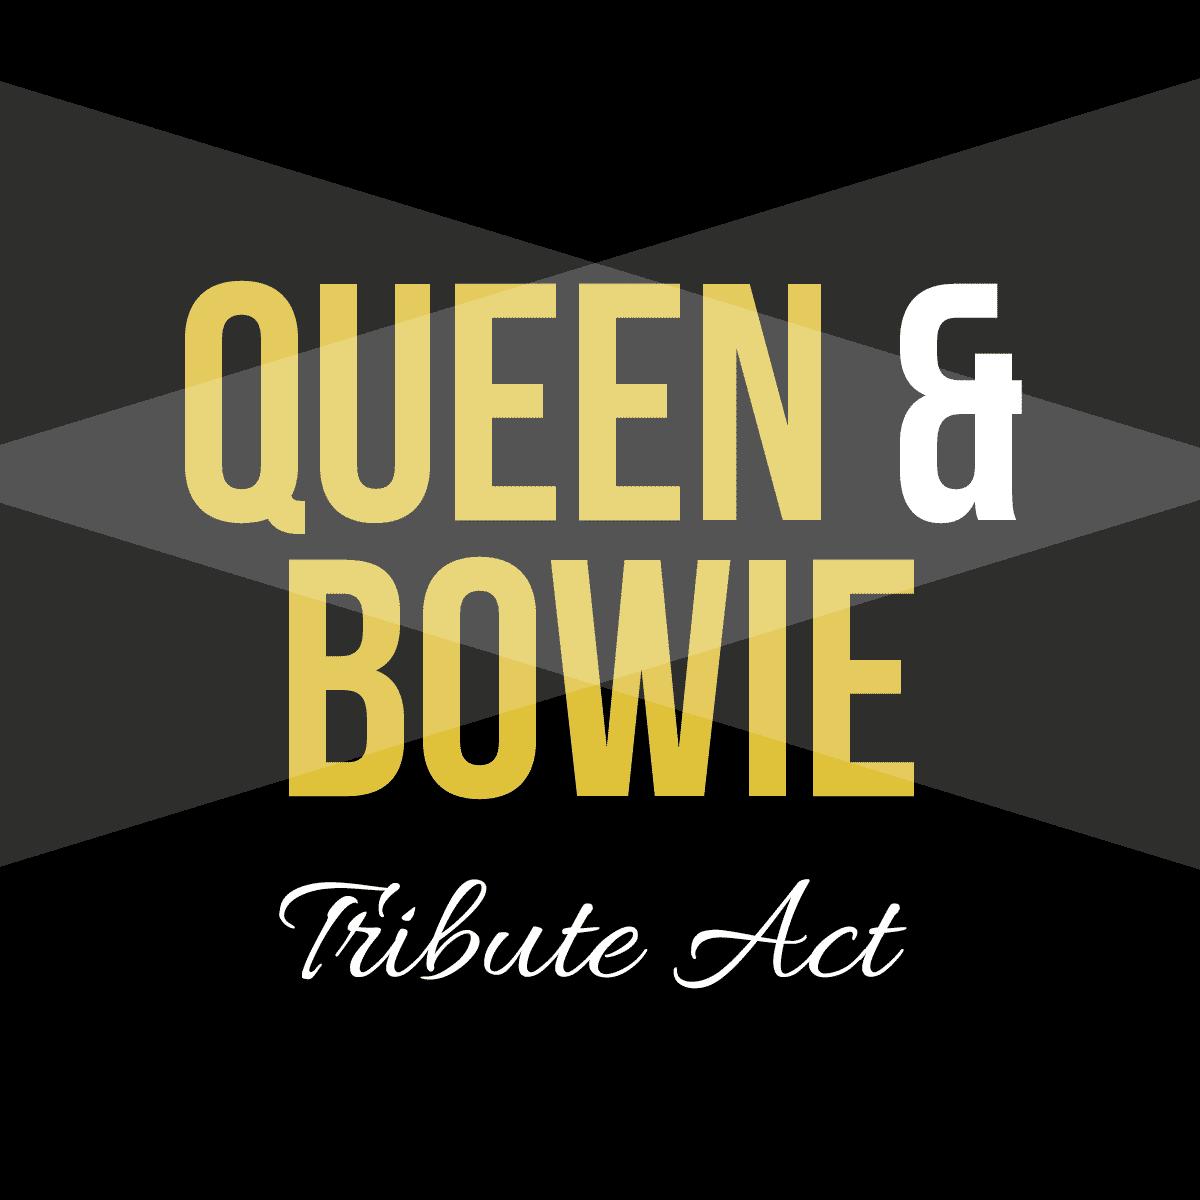 Queen & Bowie Tribute